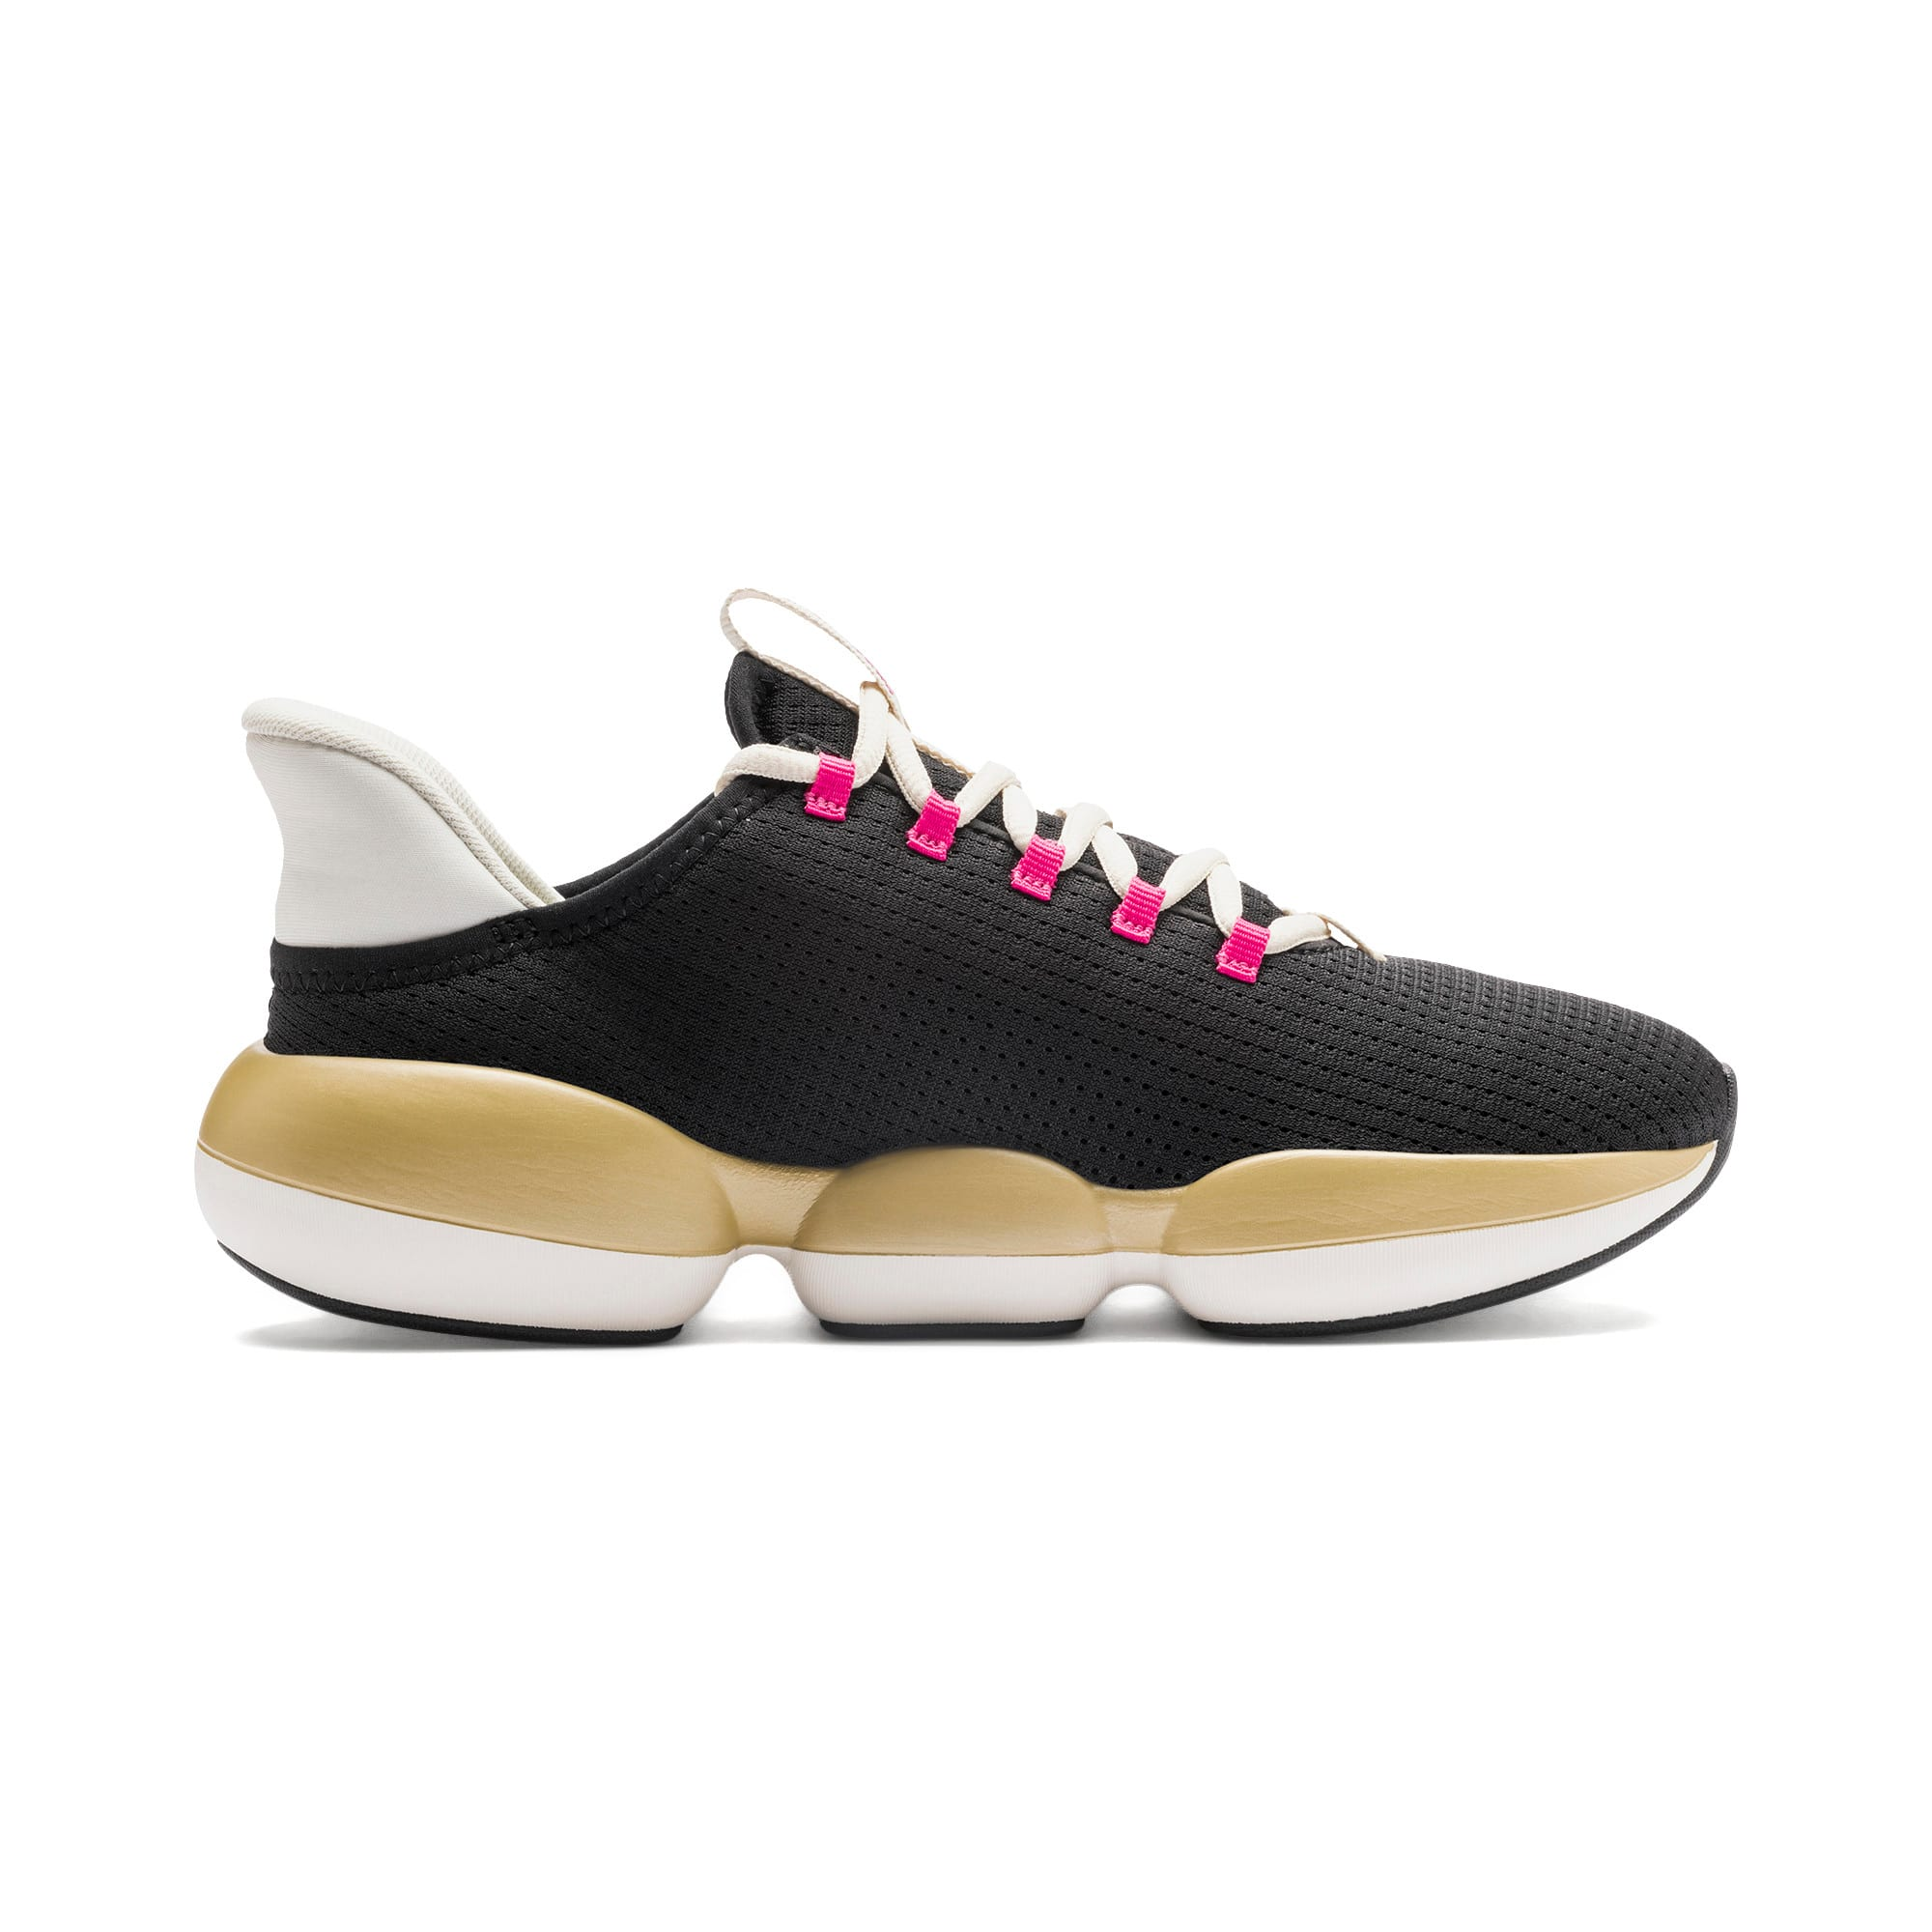 Thumbnail 5 of Mode XT Sweet Damen Sneaker, Black- White-Purple, medium